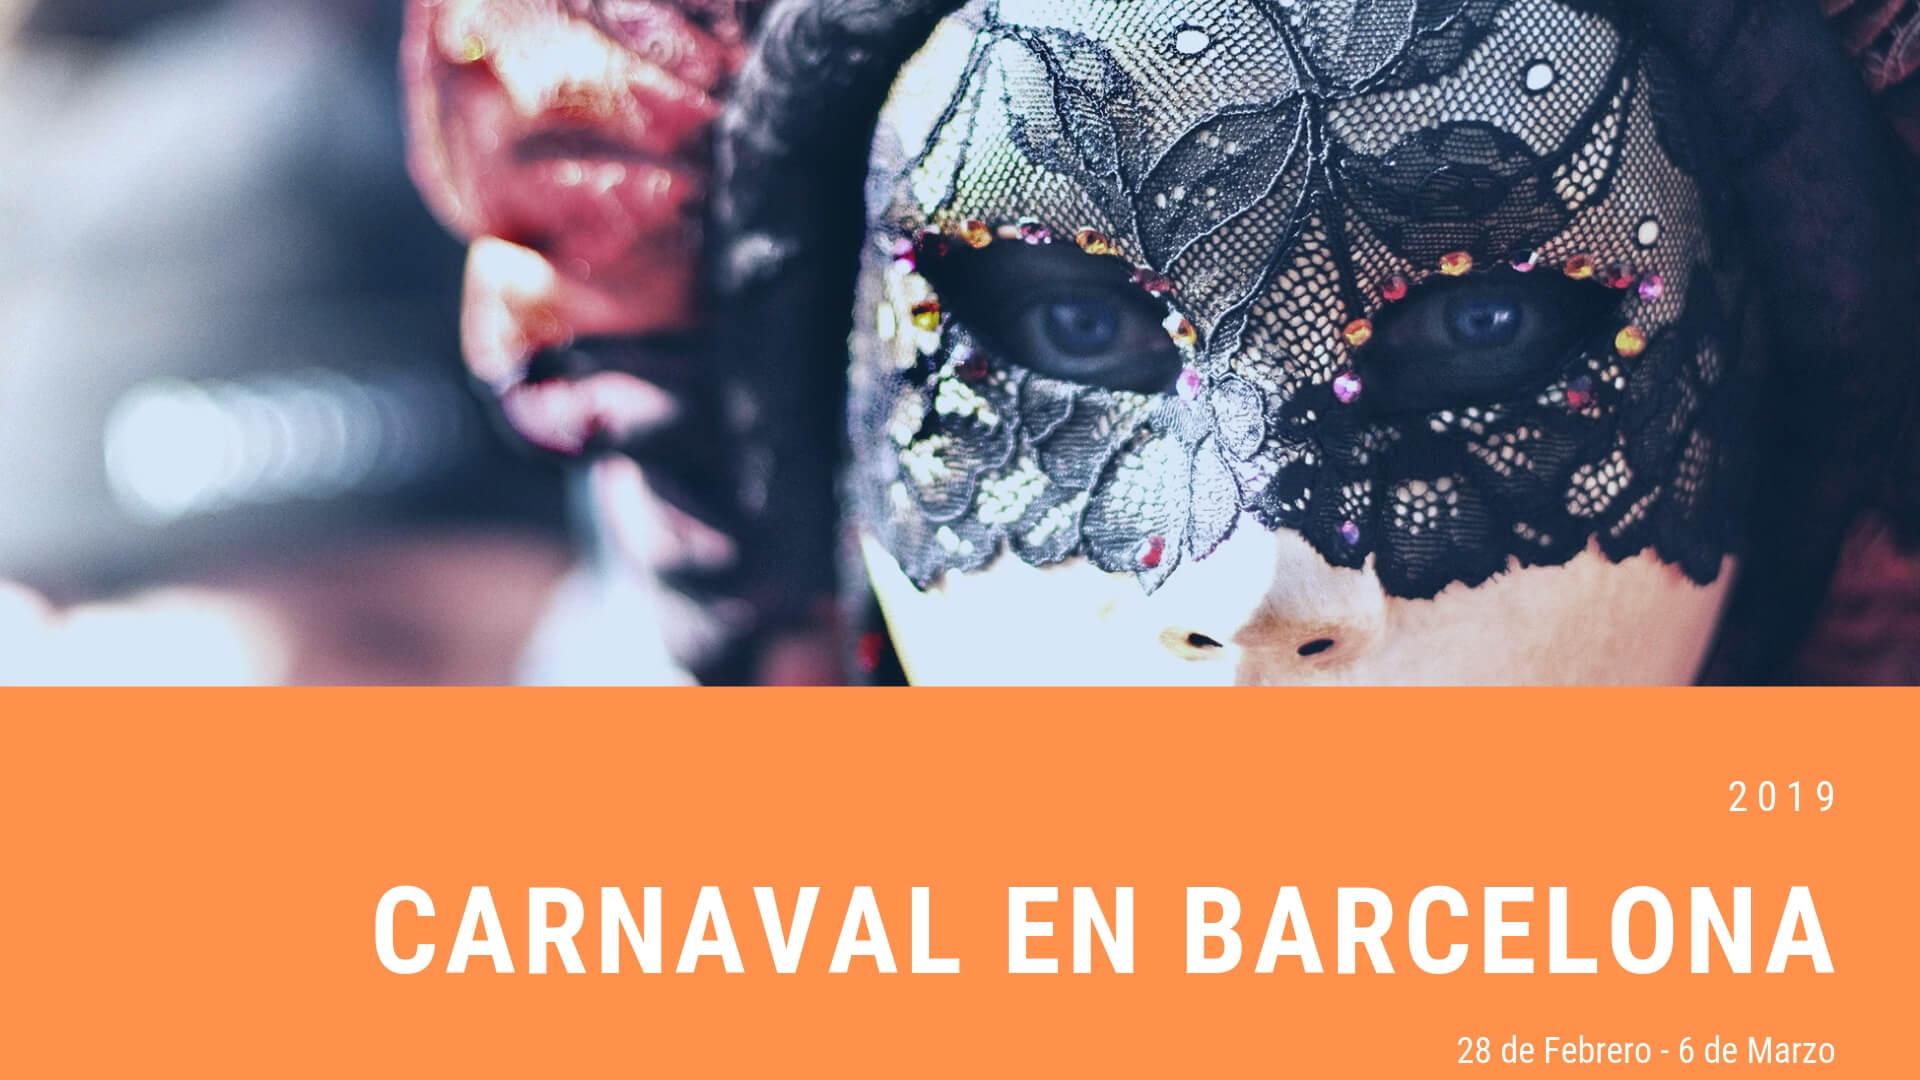 Carnaval-Barcelona-2019-1.jpg